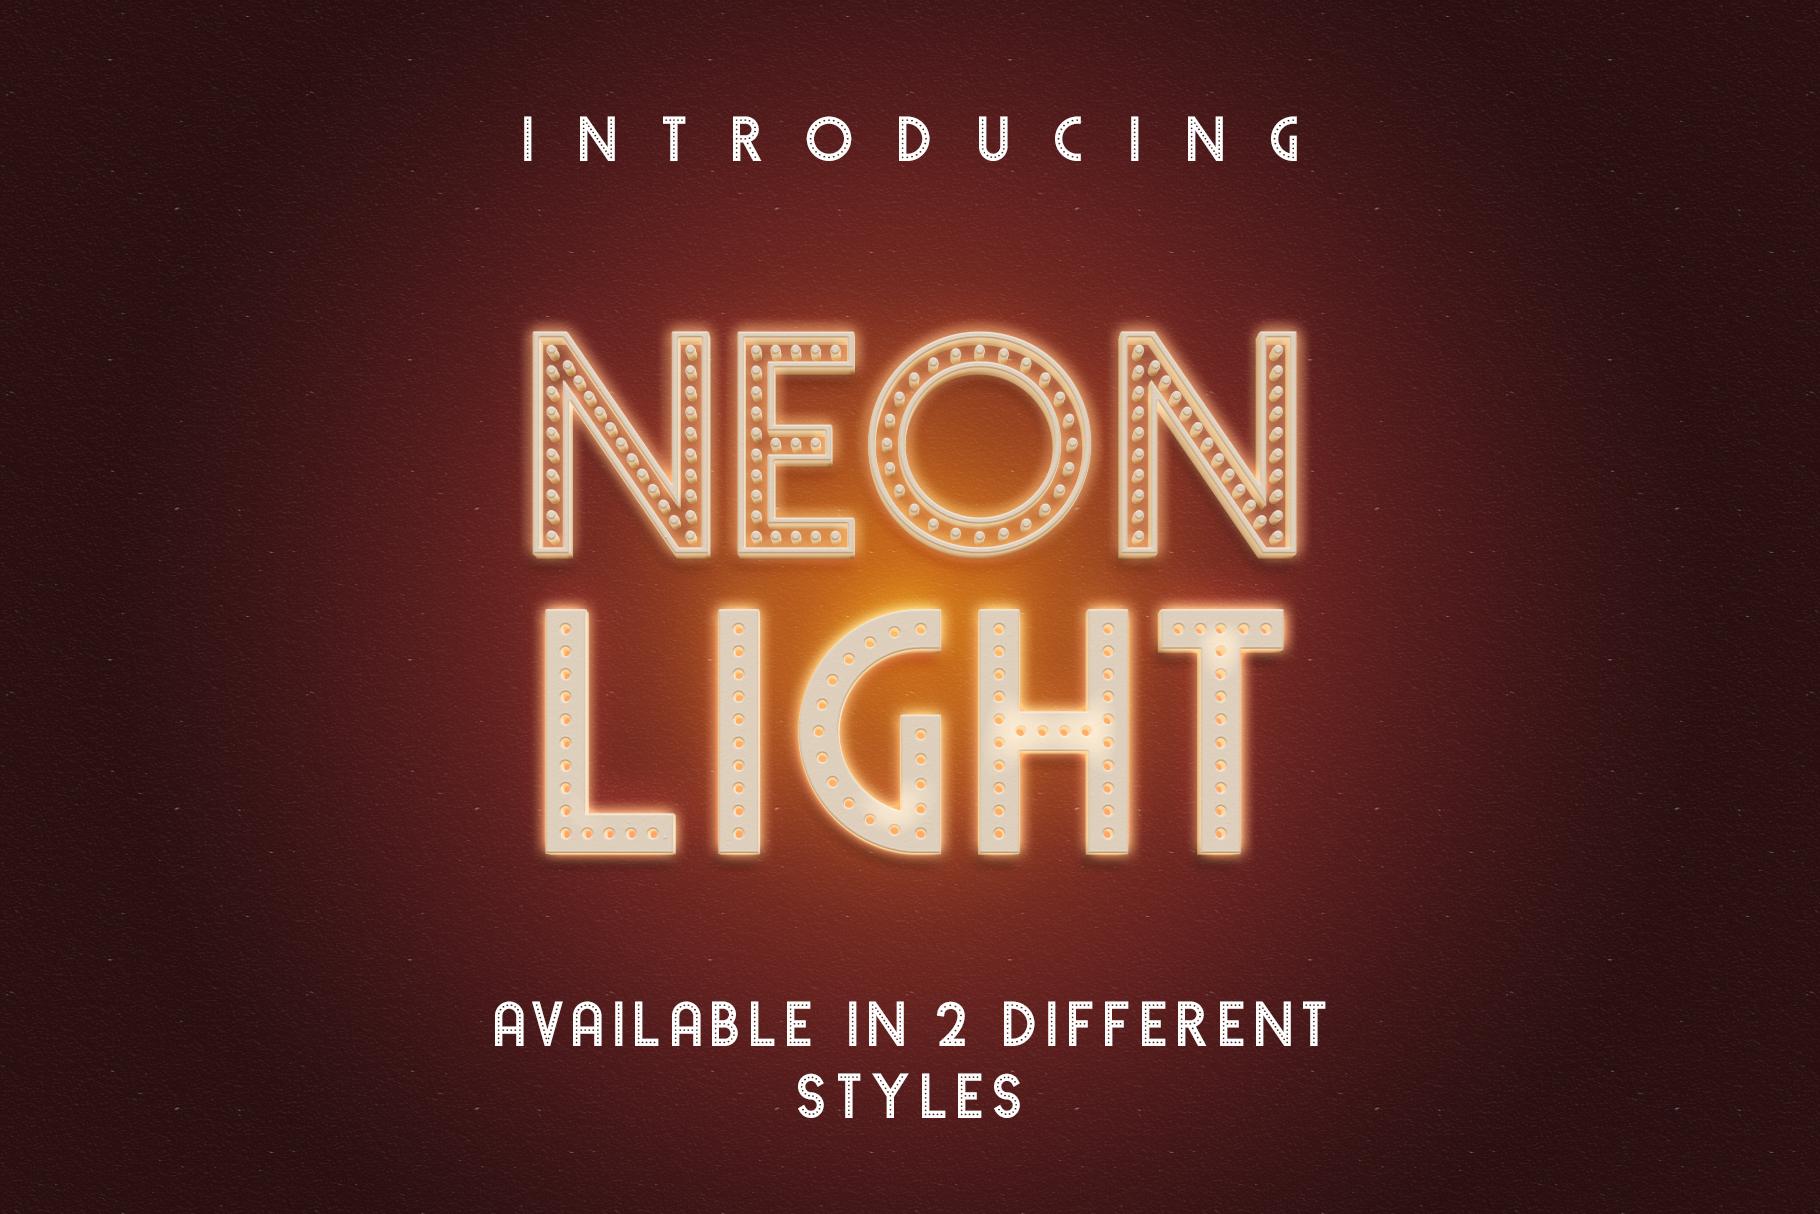 Neon Light example 1